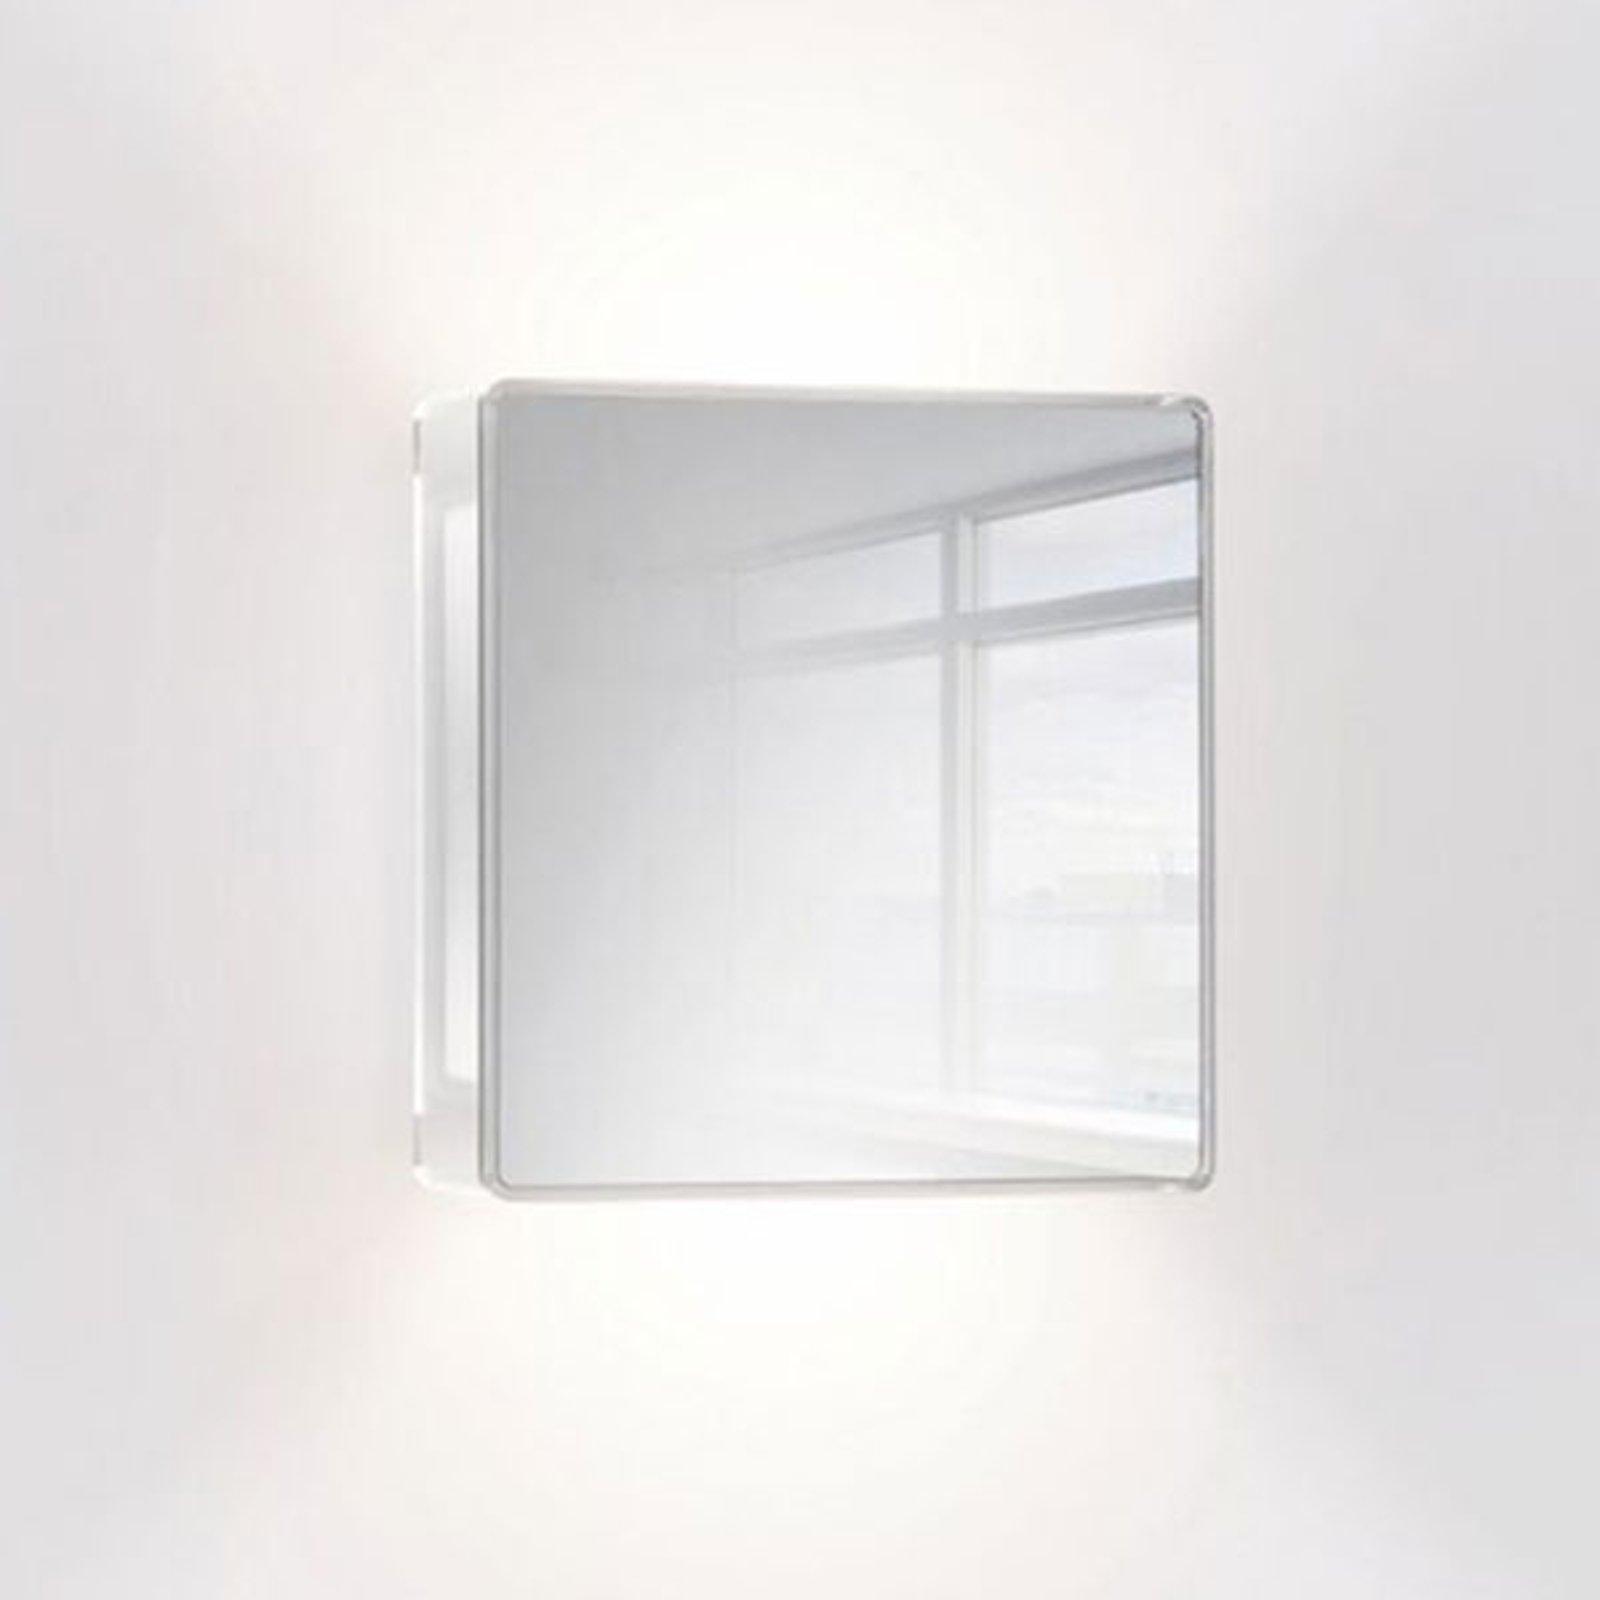 Designer-LED-vegglampe App med speilflate